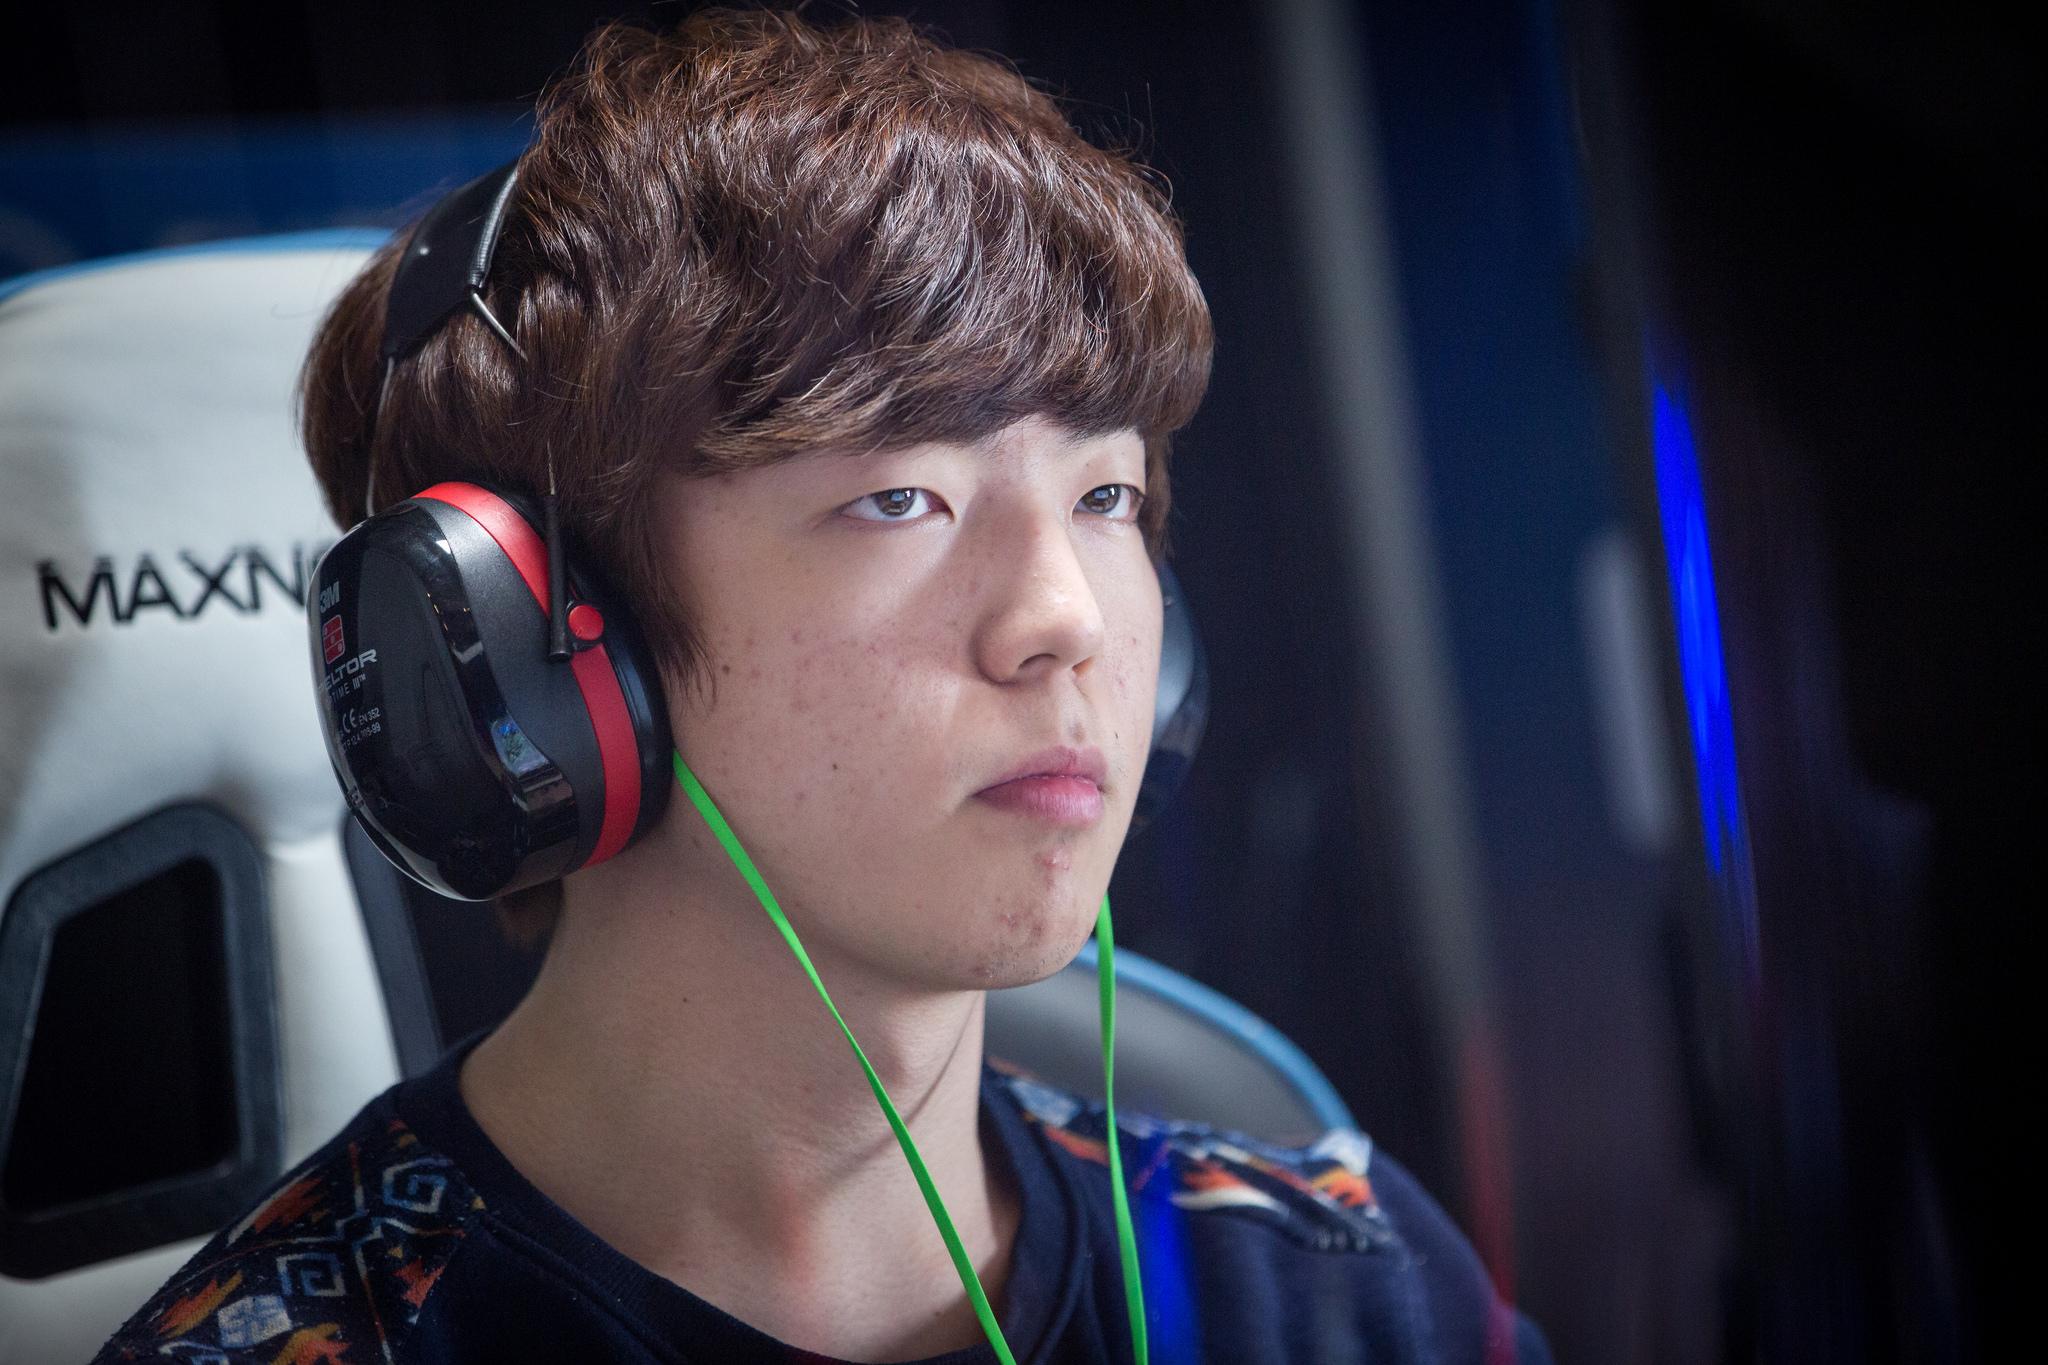 Lee 'Life' Seung Hyun at IEM World Championship 2015